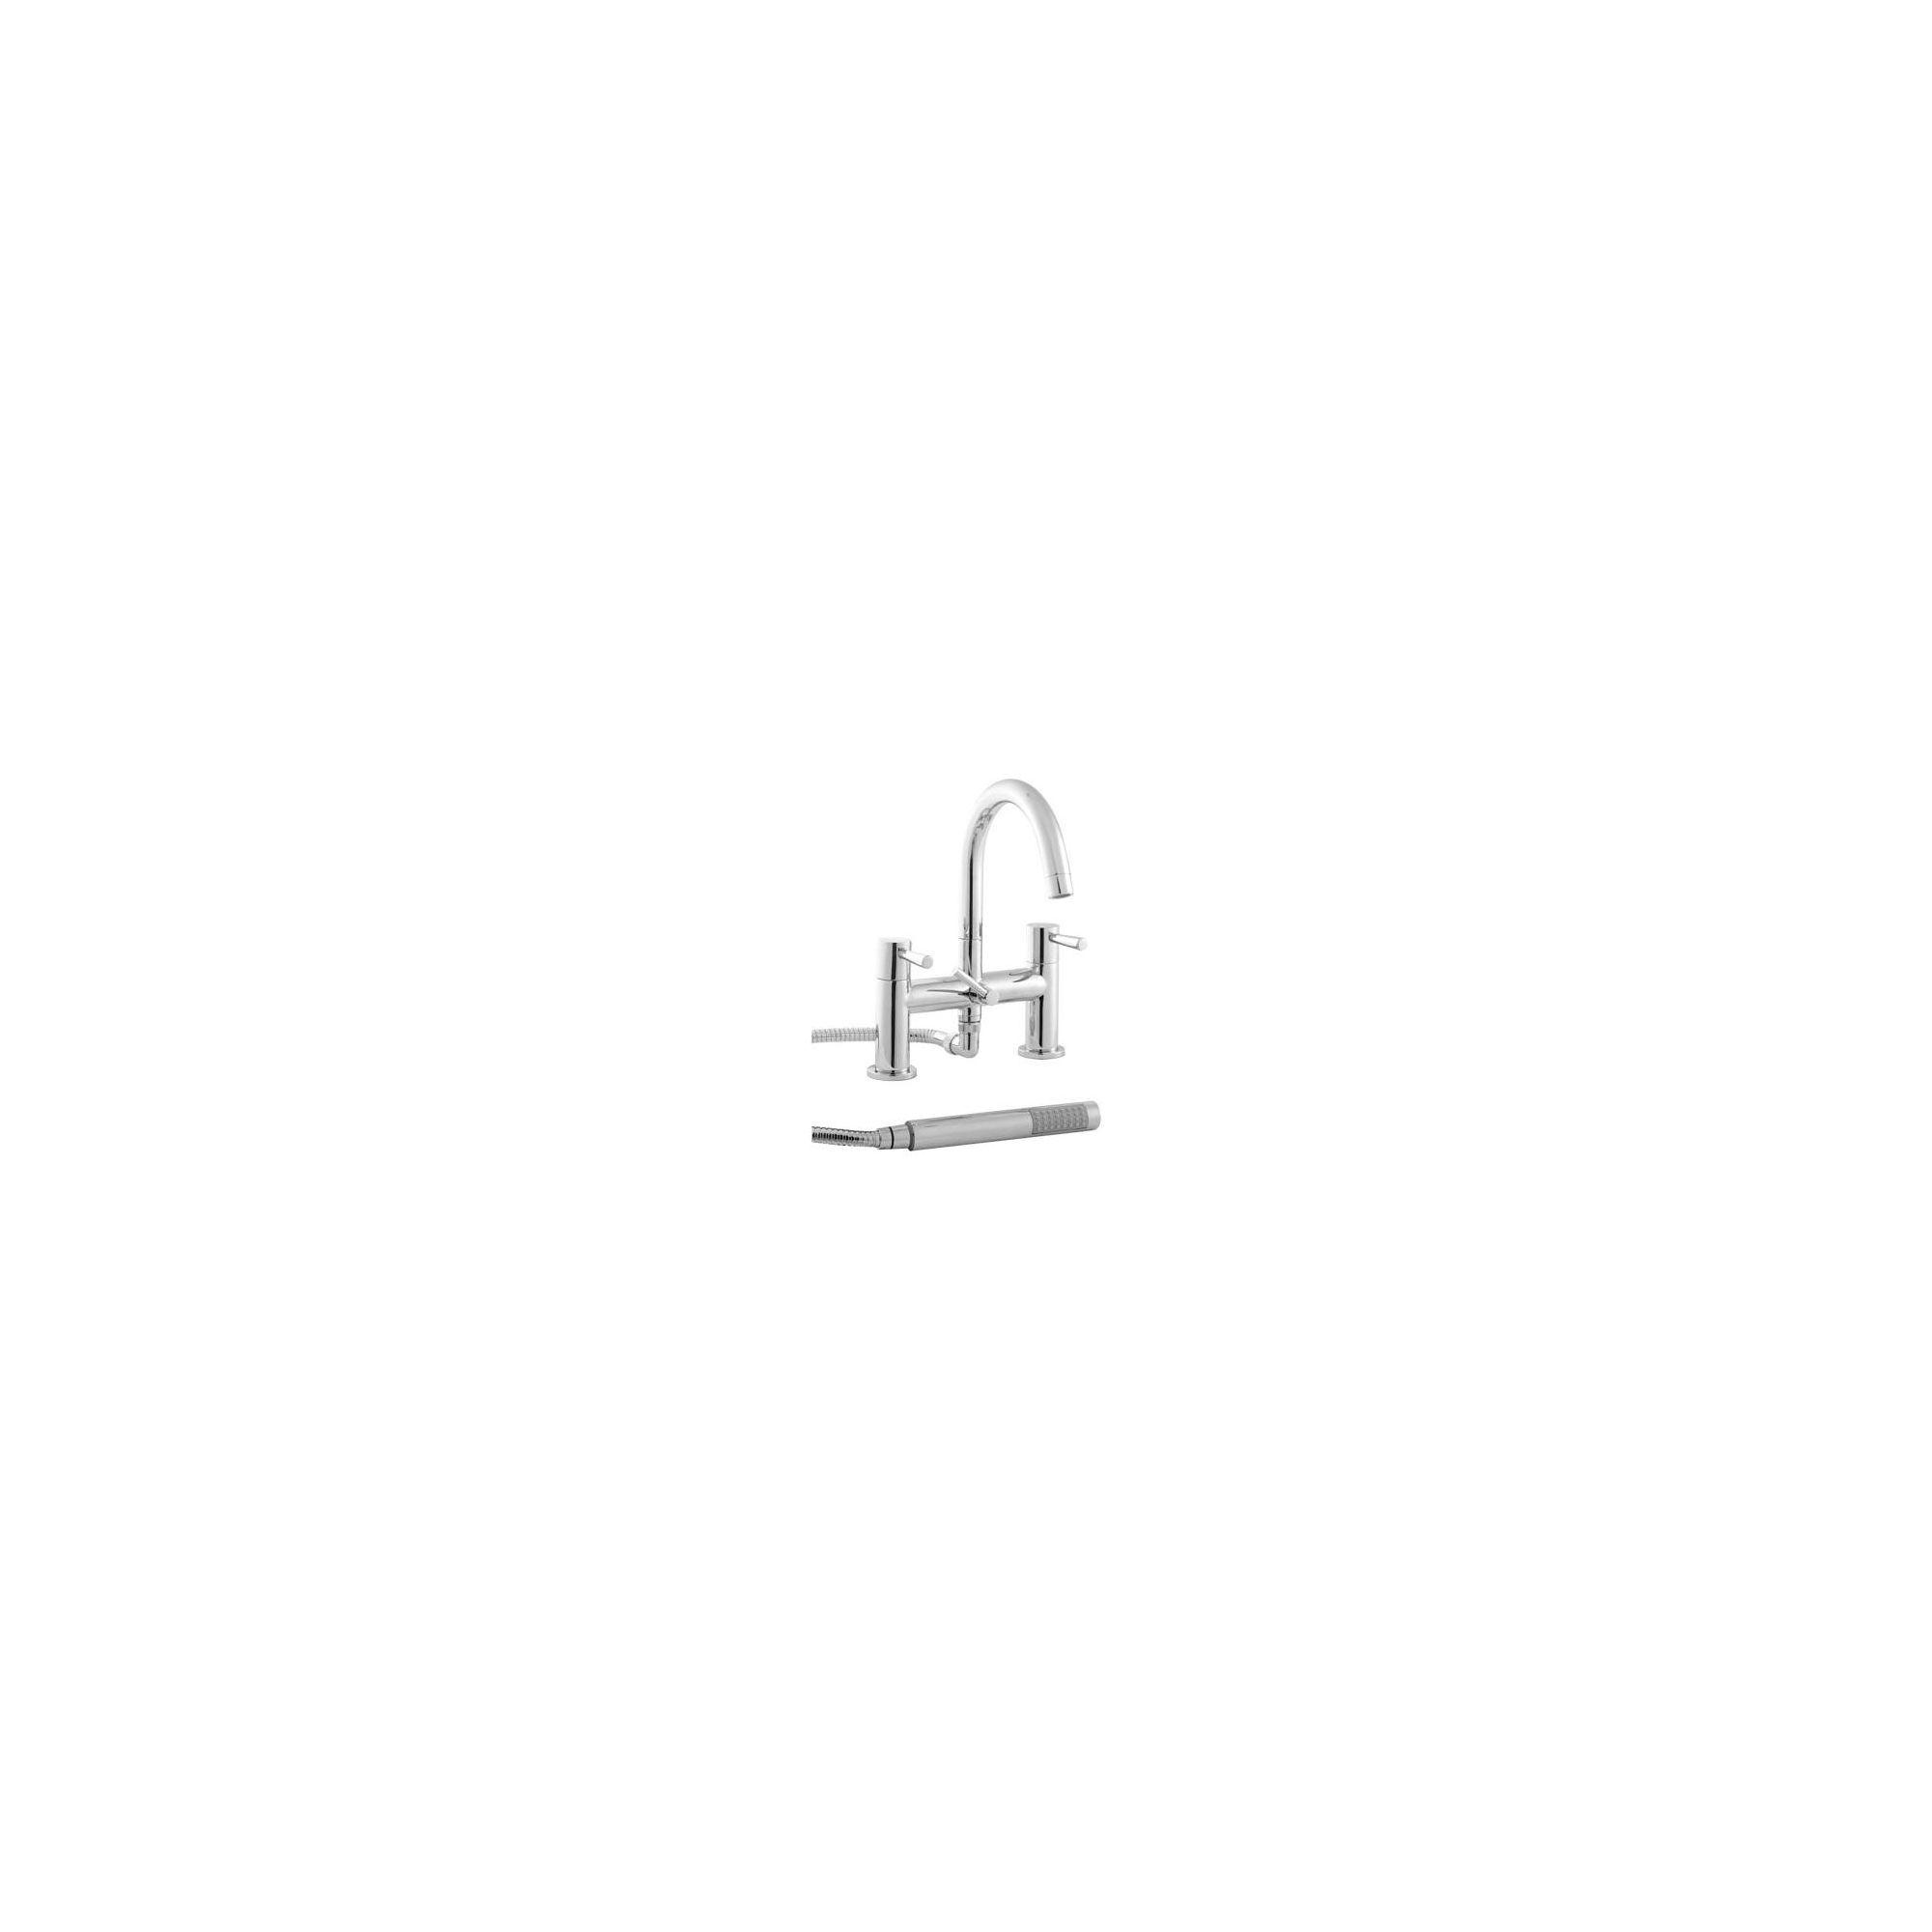 Twyford Siron Pillar Mounted Bath Shower Mixer Tap Chrome at Tesco Direct